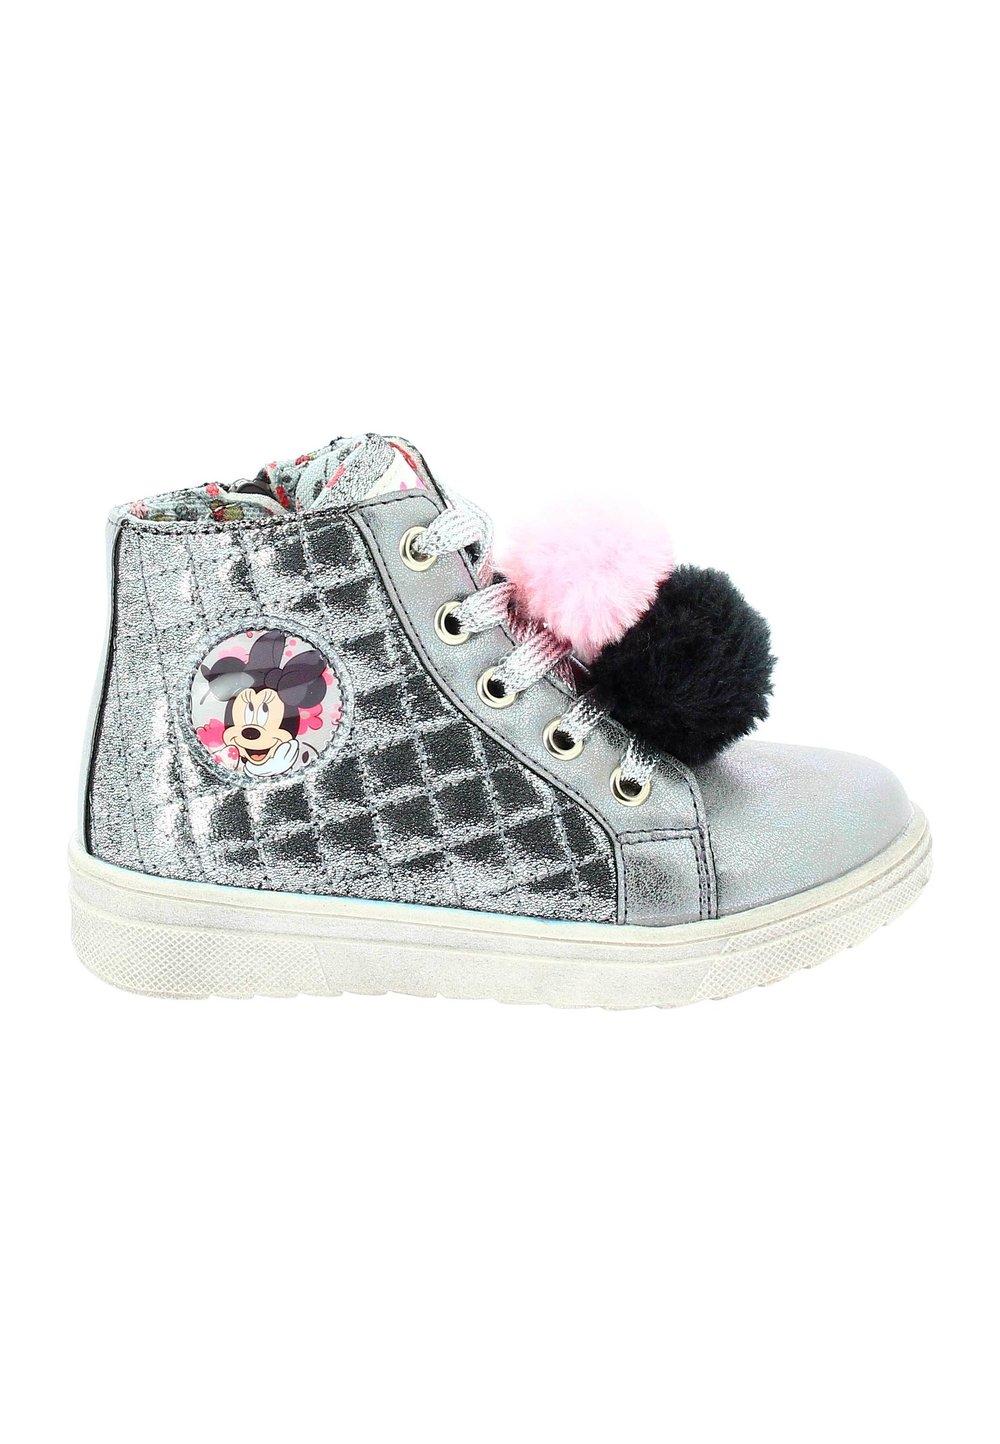 Ghete argintii, Minnie Mouse imagine